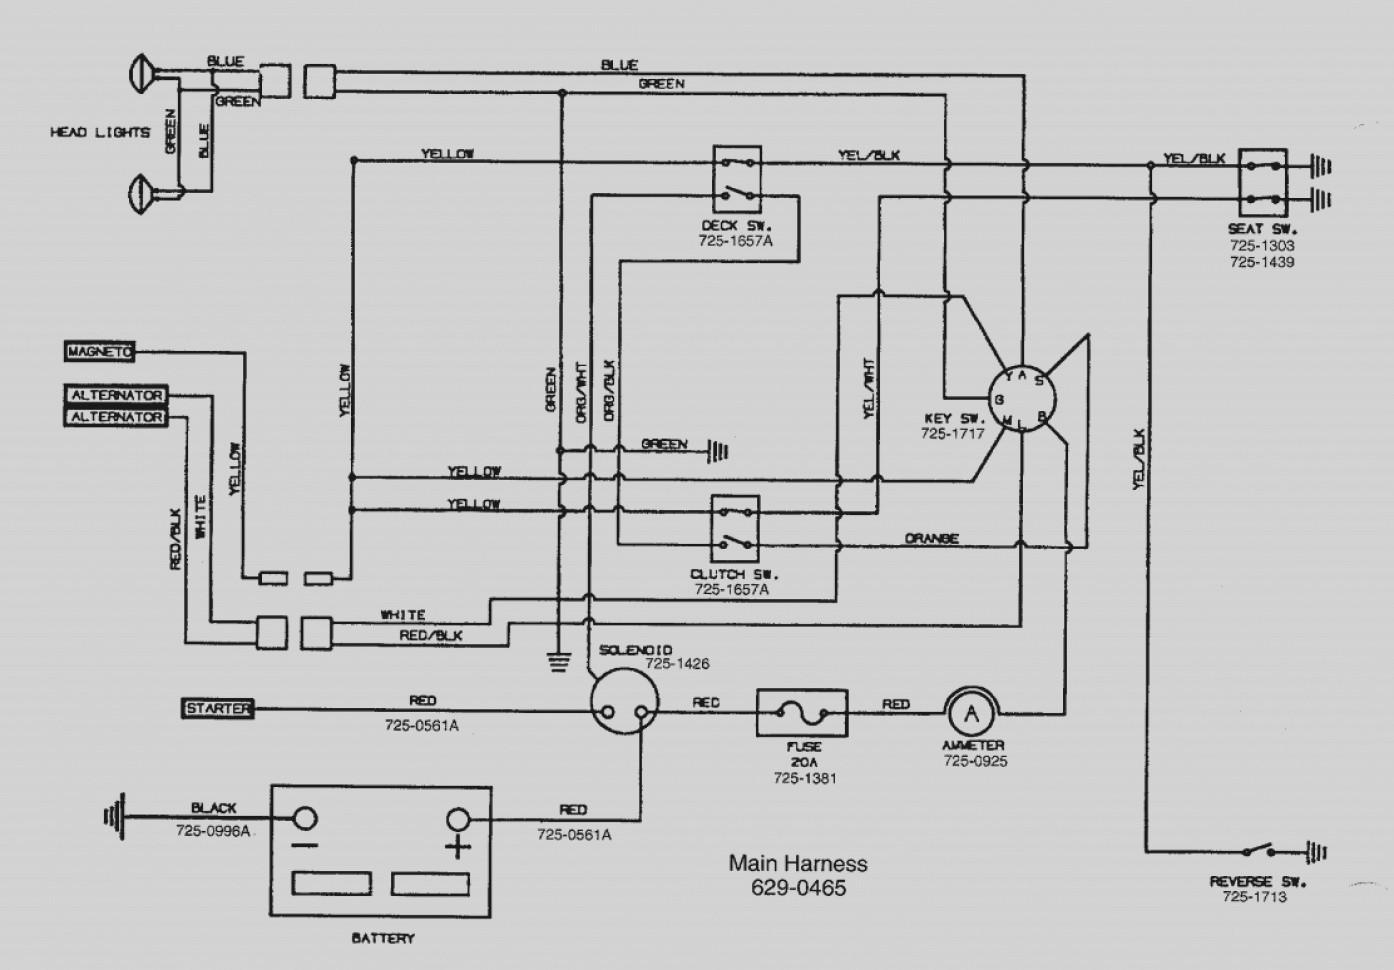 Yardman Kohler Wiring Diagram Simple Schema Viking Diagrams Box